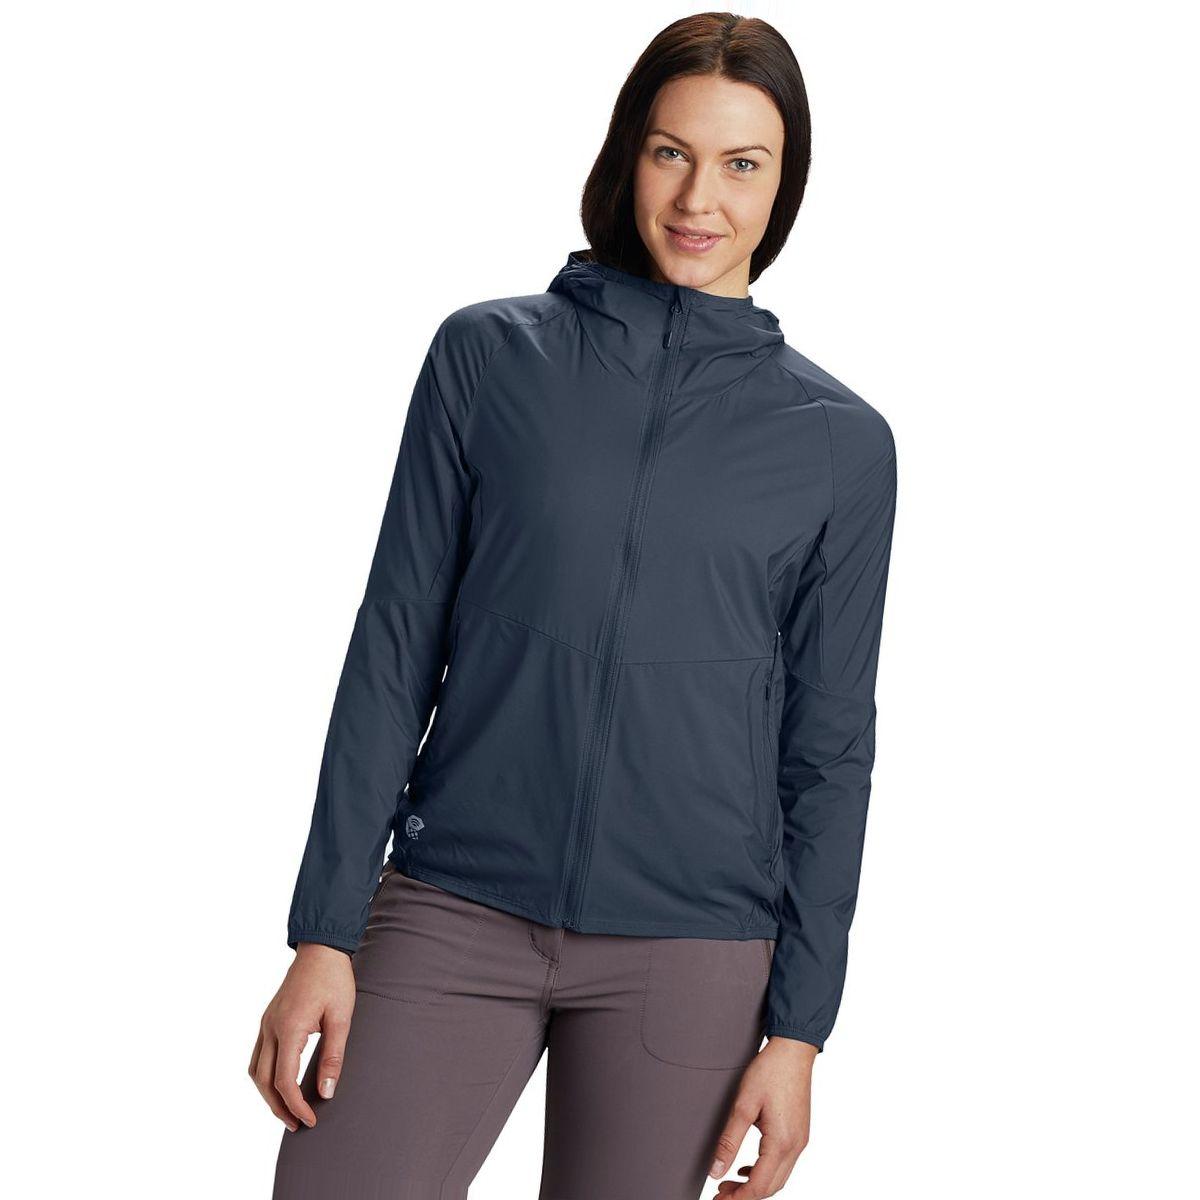 Mountain Hardwear Kor Preshell Hooded Jacket - Women's